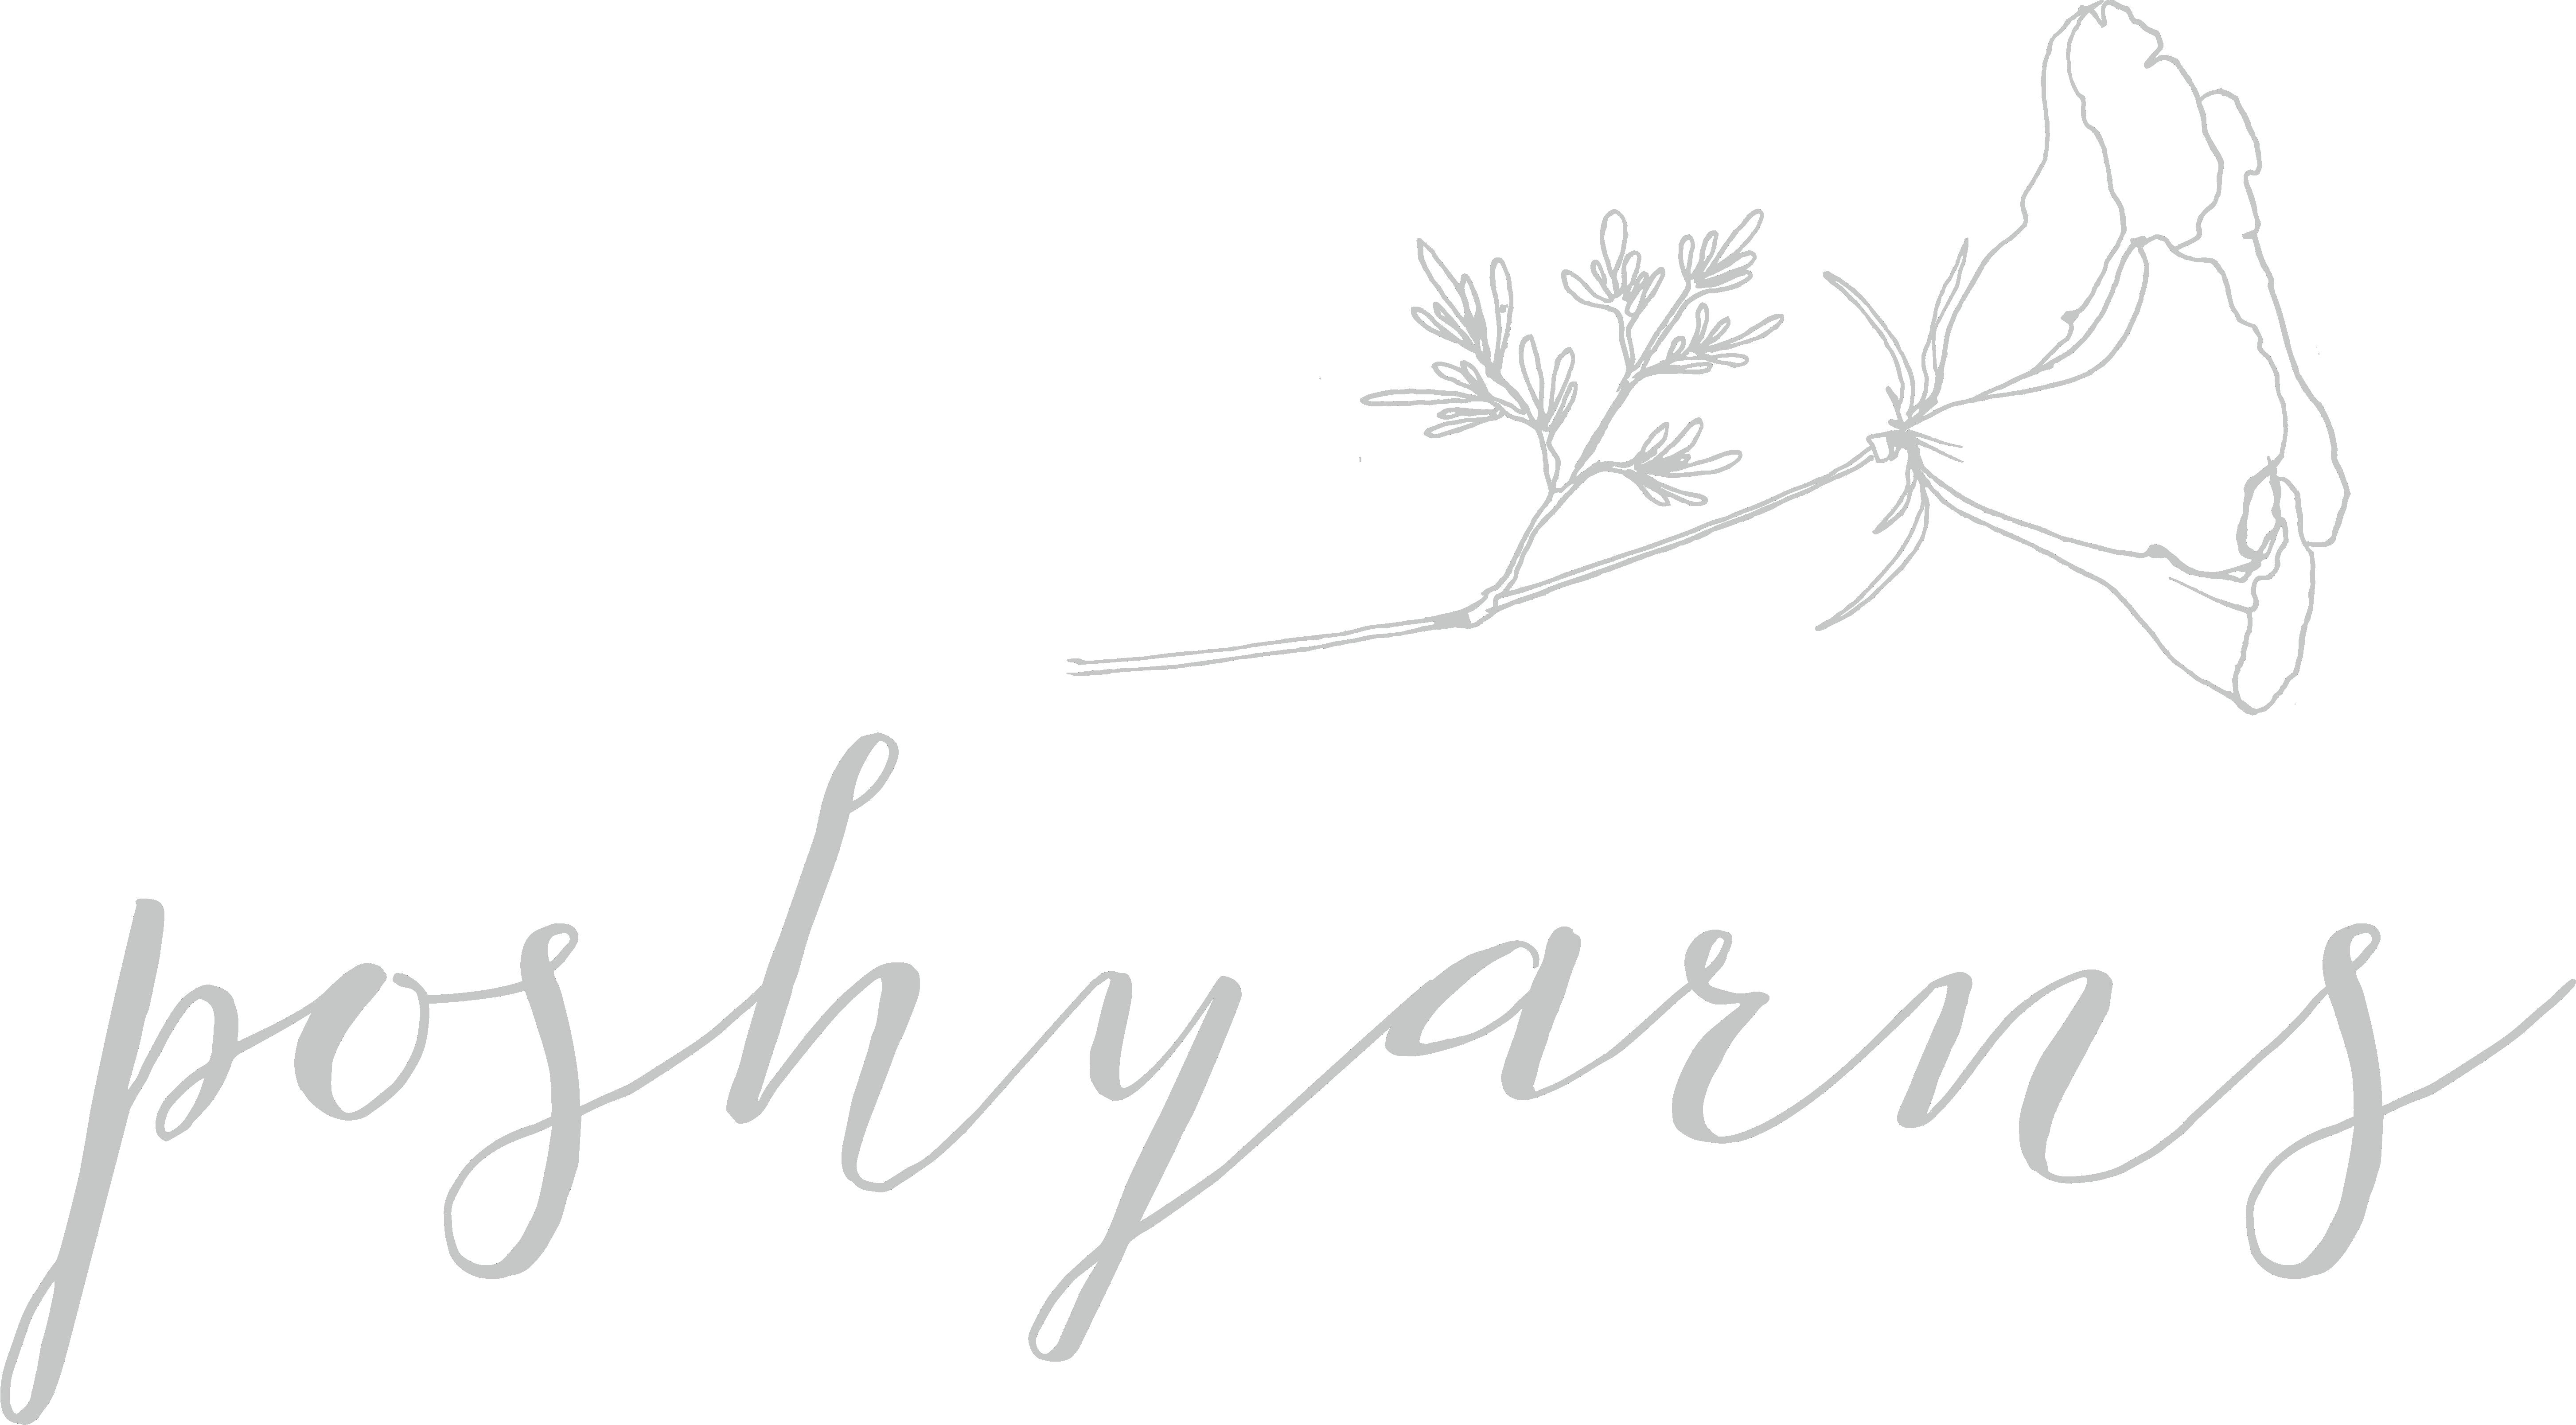 Poshyarns